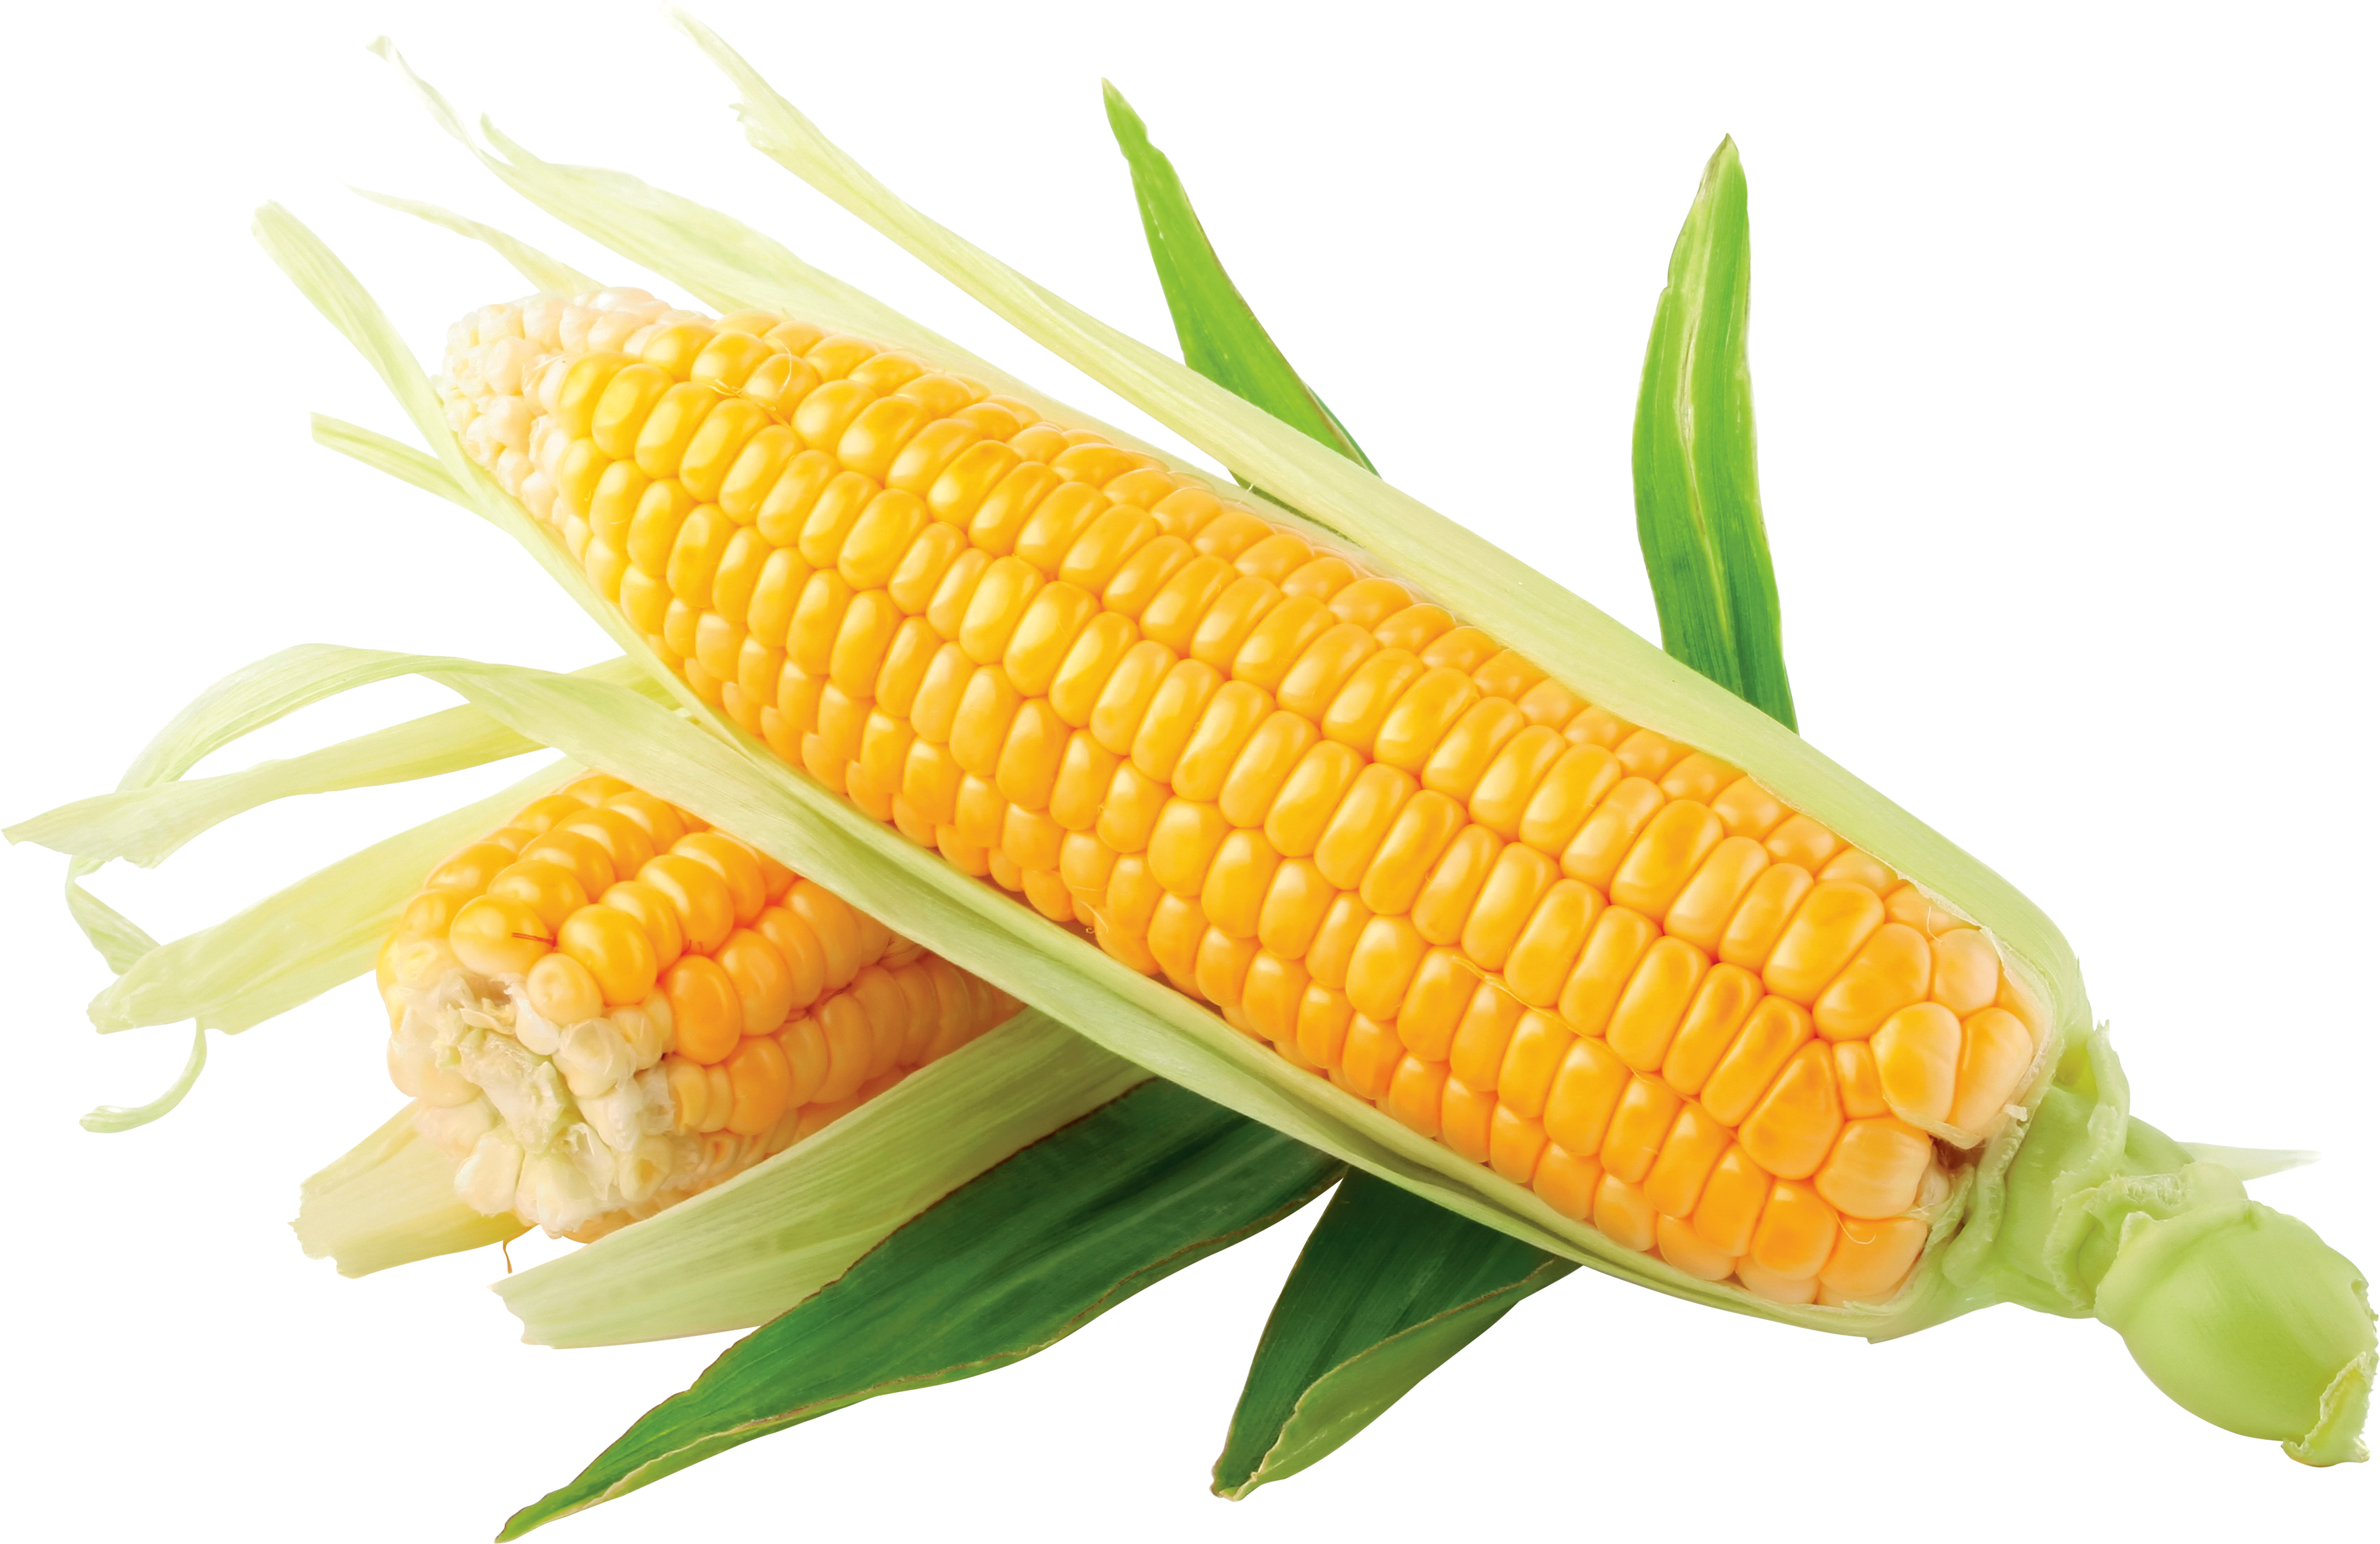 Grain clipart corn grain. Images download yellow clip